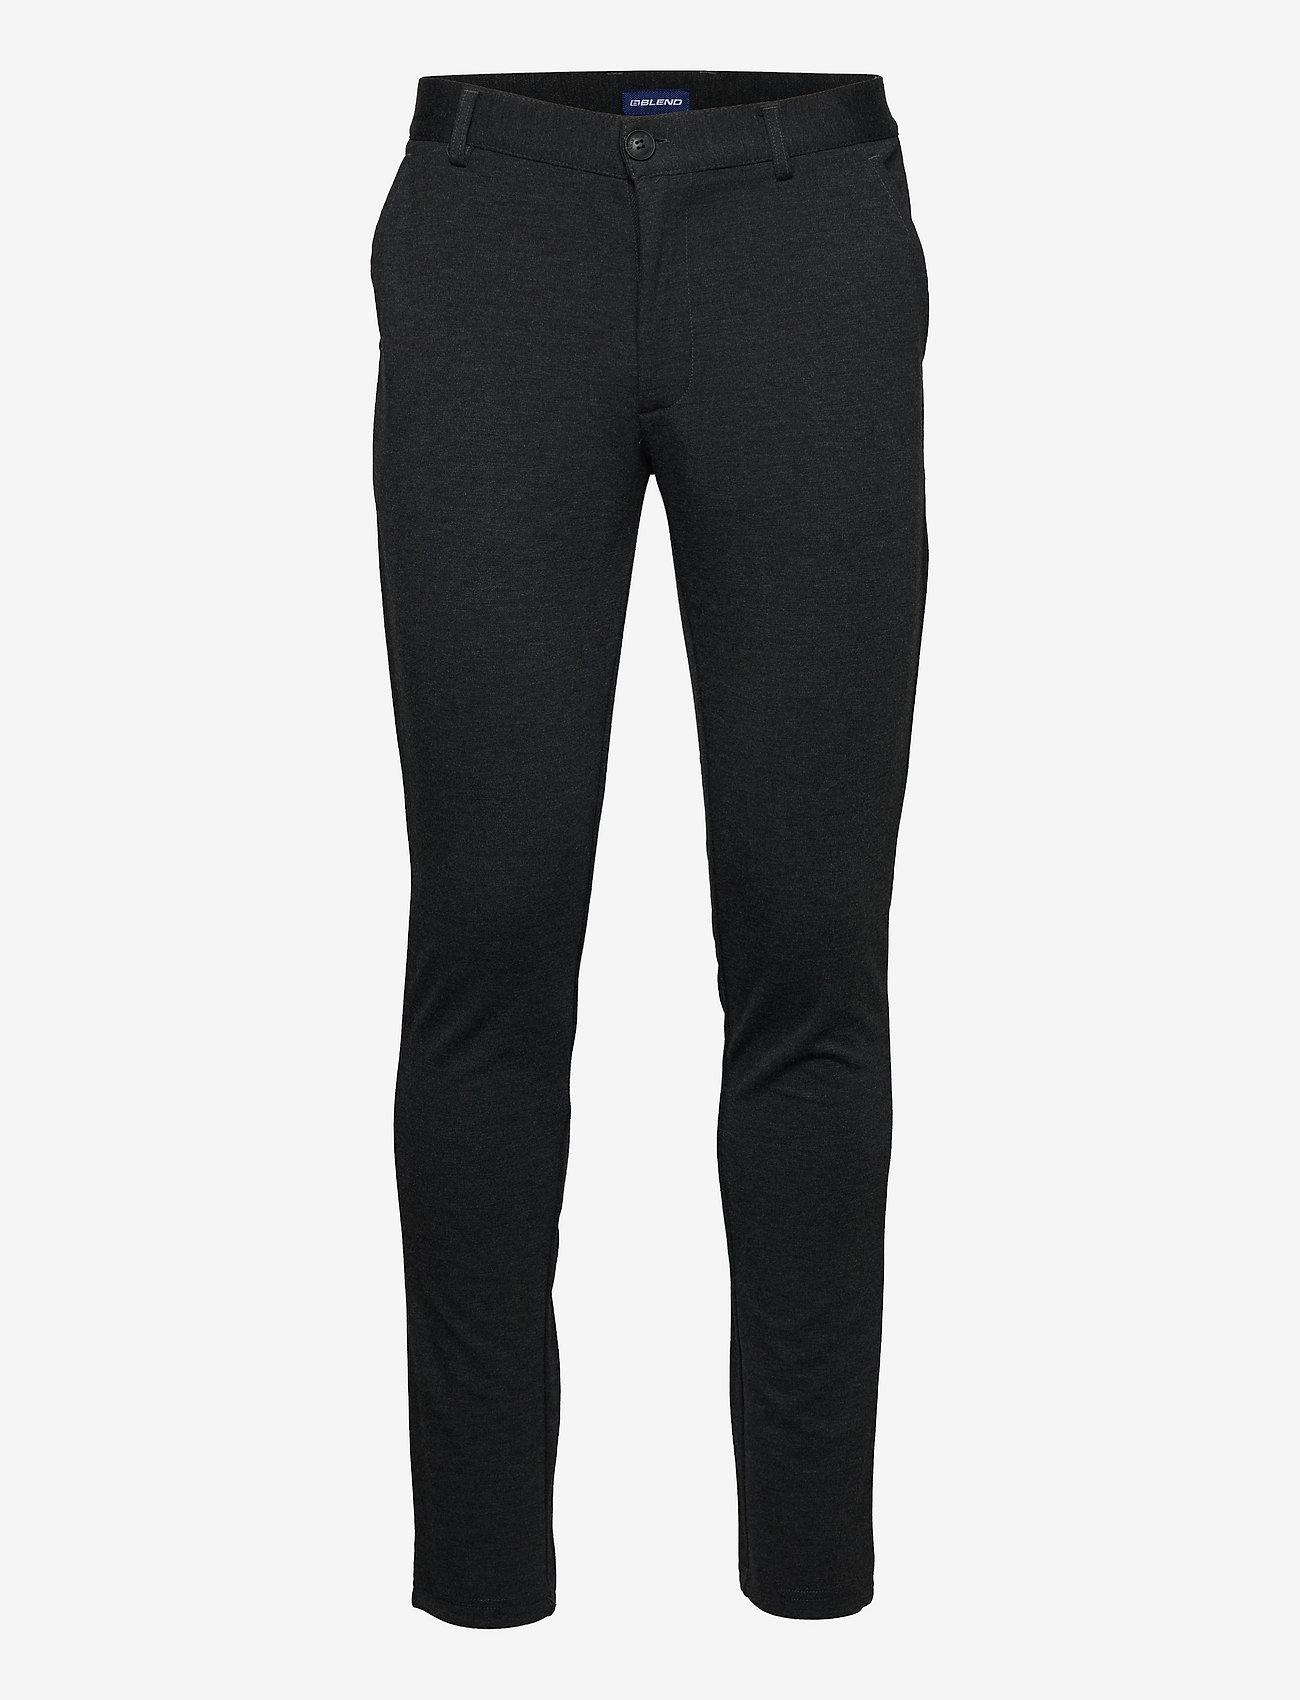 Blend - Pants - od garnituru - charcoal - 0